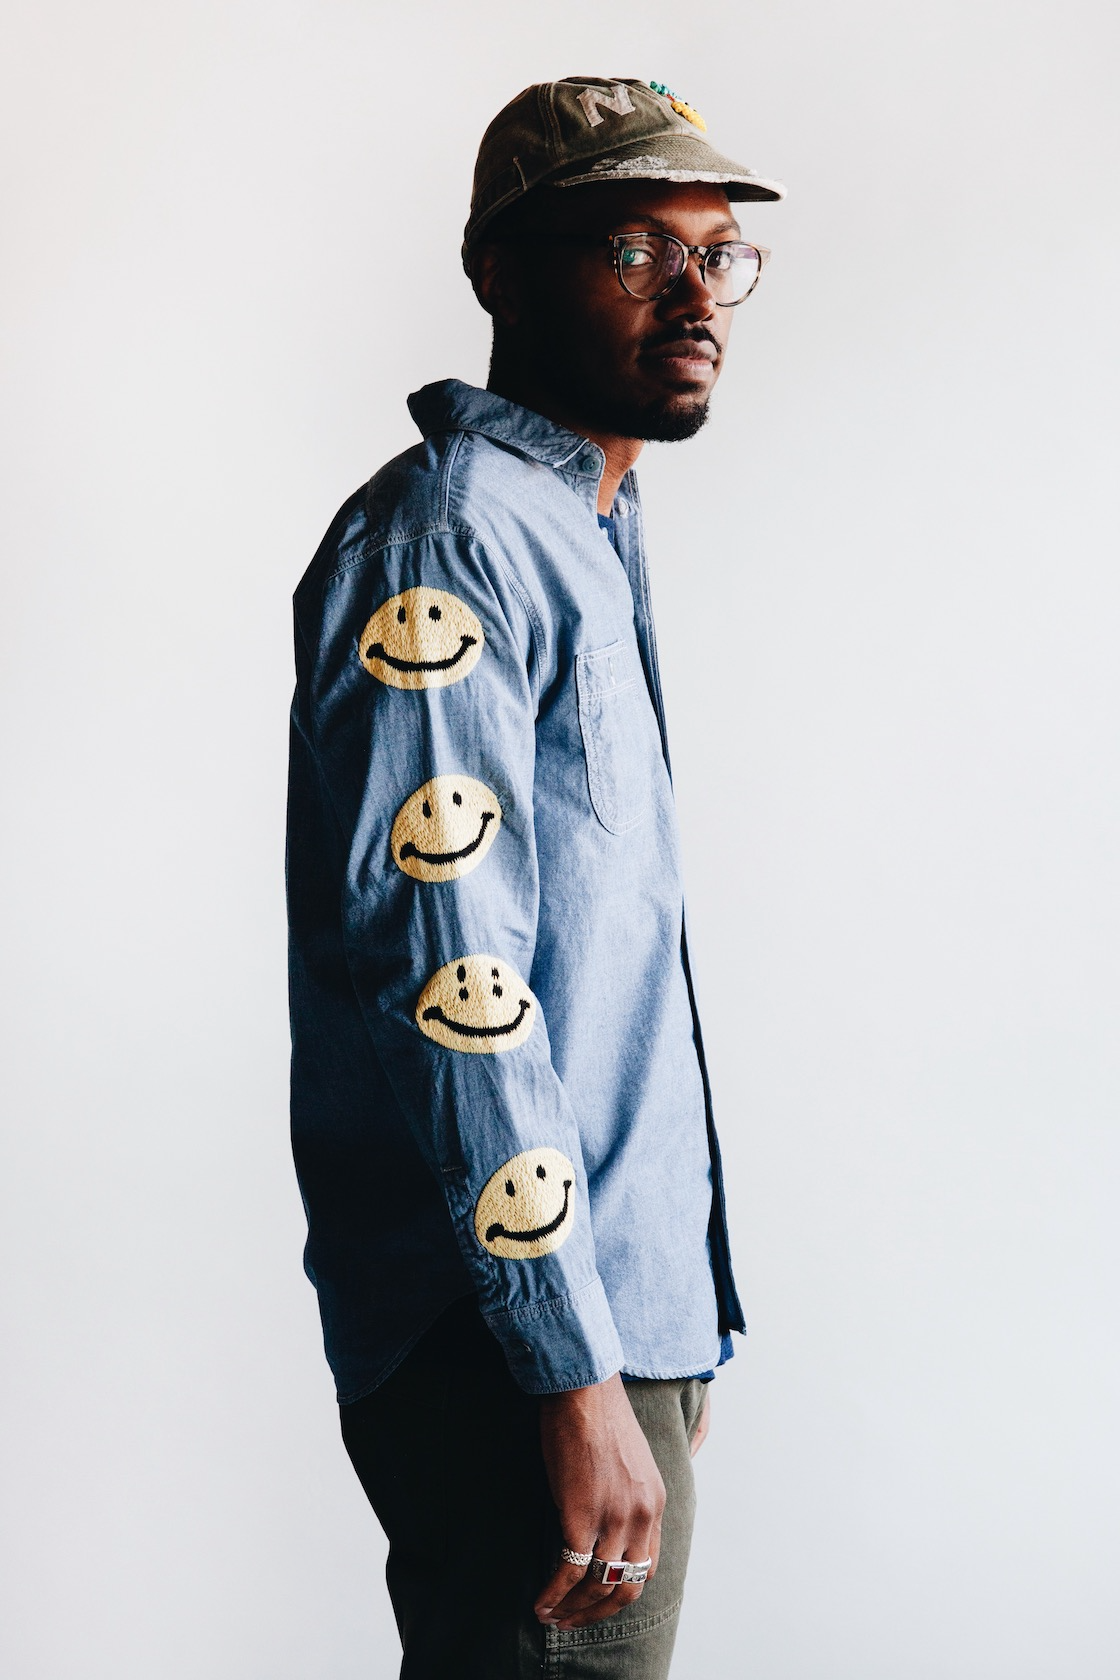 kapital kountry clothing japan smiley shirt on body